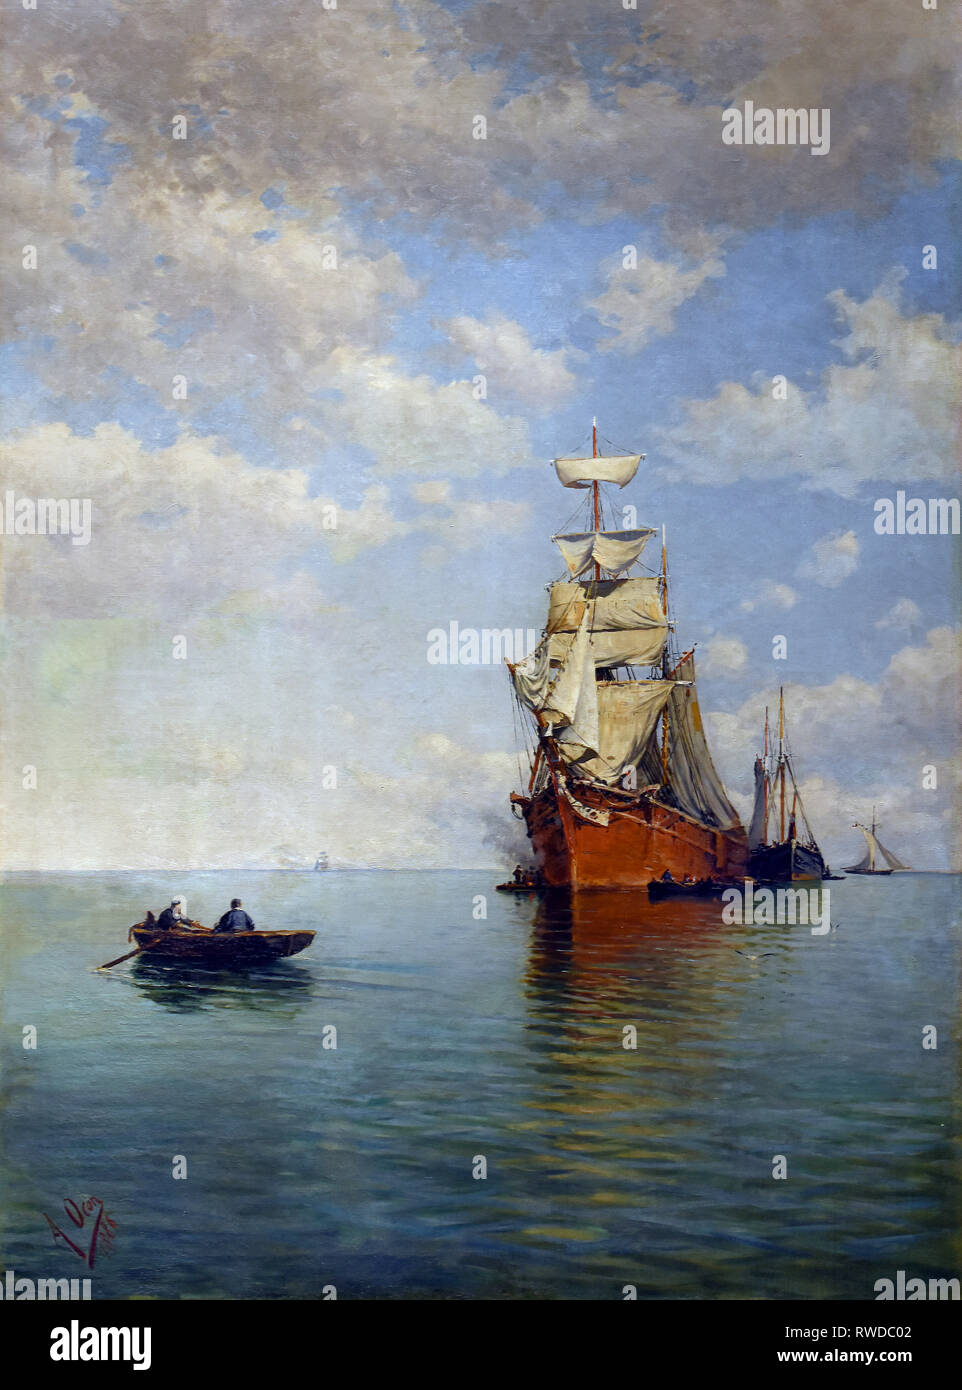 Seascape - High seas 1886 by Adolfo Ocon y Toribio 1860-1939 Spain,Spanish - Stock Image